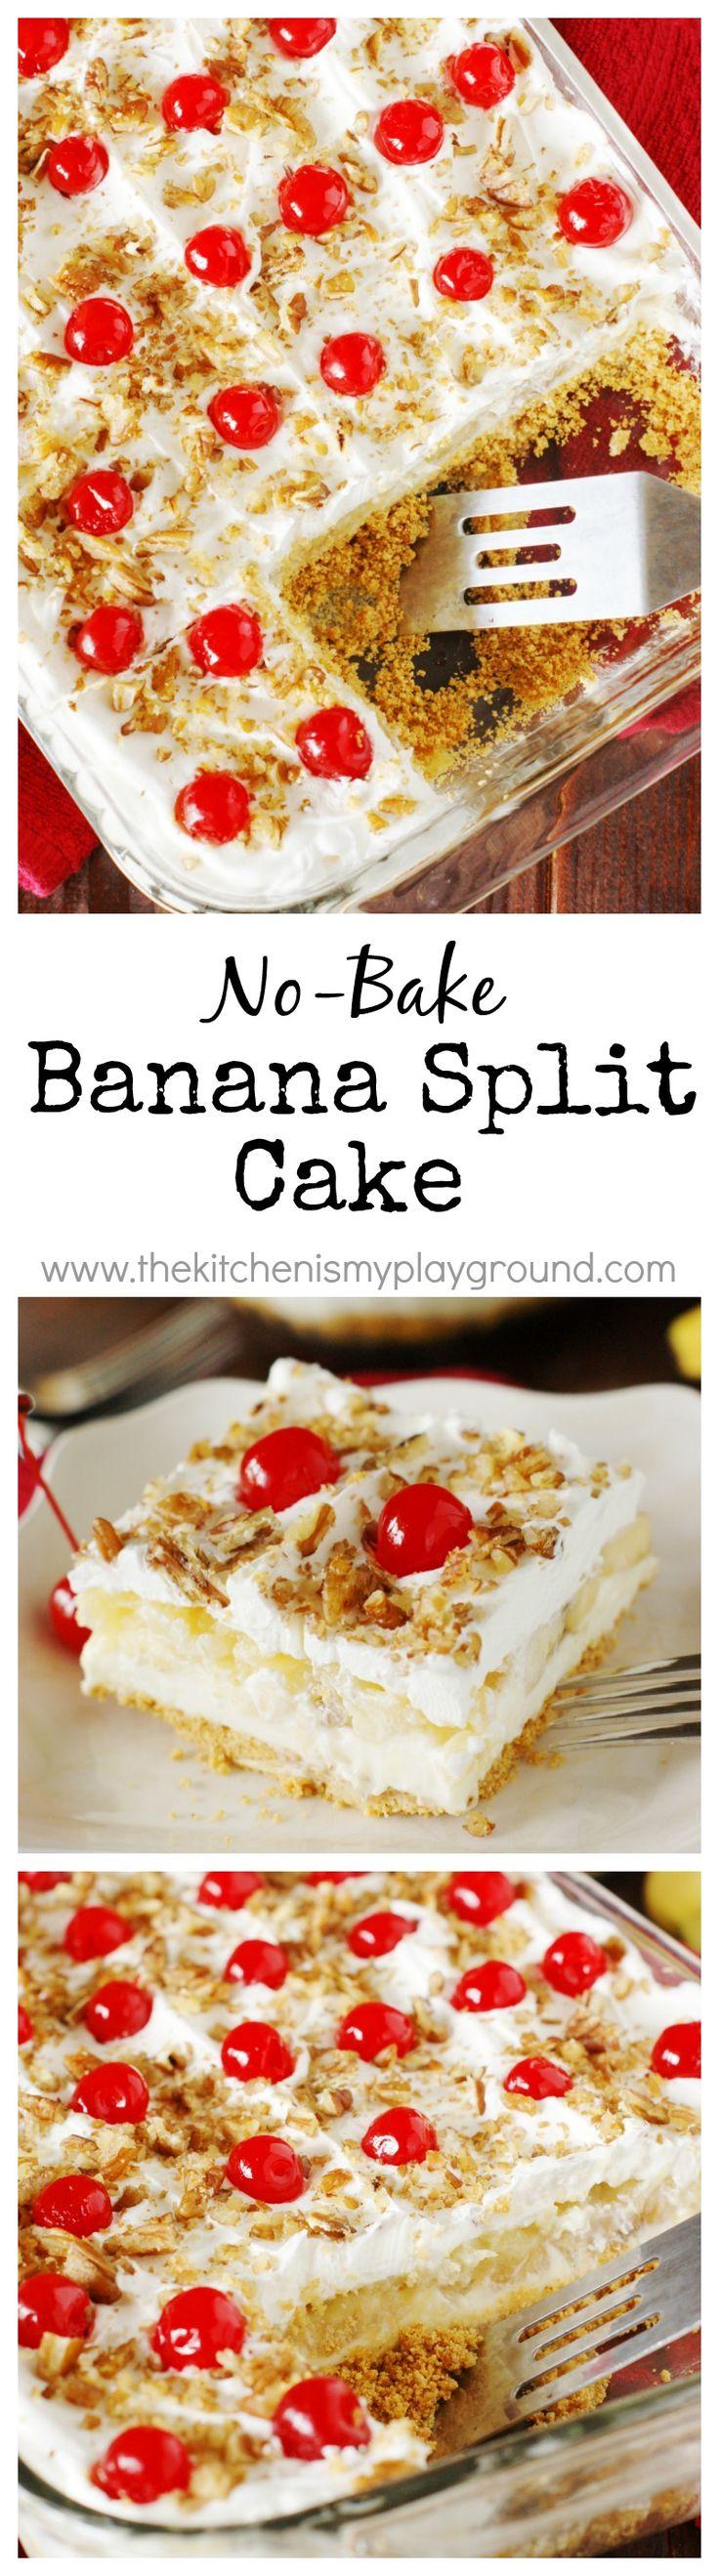 No-Bake Banana Split Cake ~ All the fabulous flavors of a scrumptiously melty banana split sundae, in an easy to prepare no-bake dessert!   www.thekitchenismyplayground.com